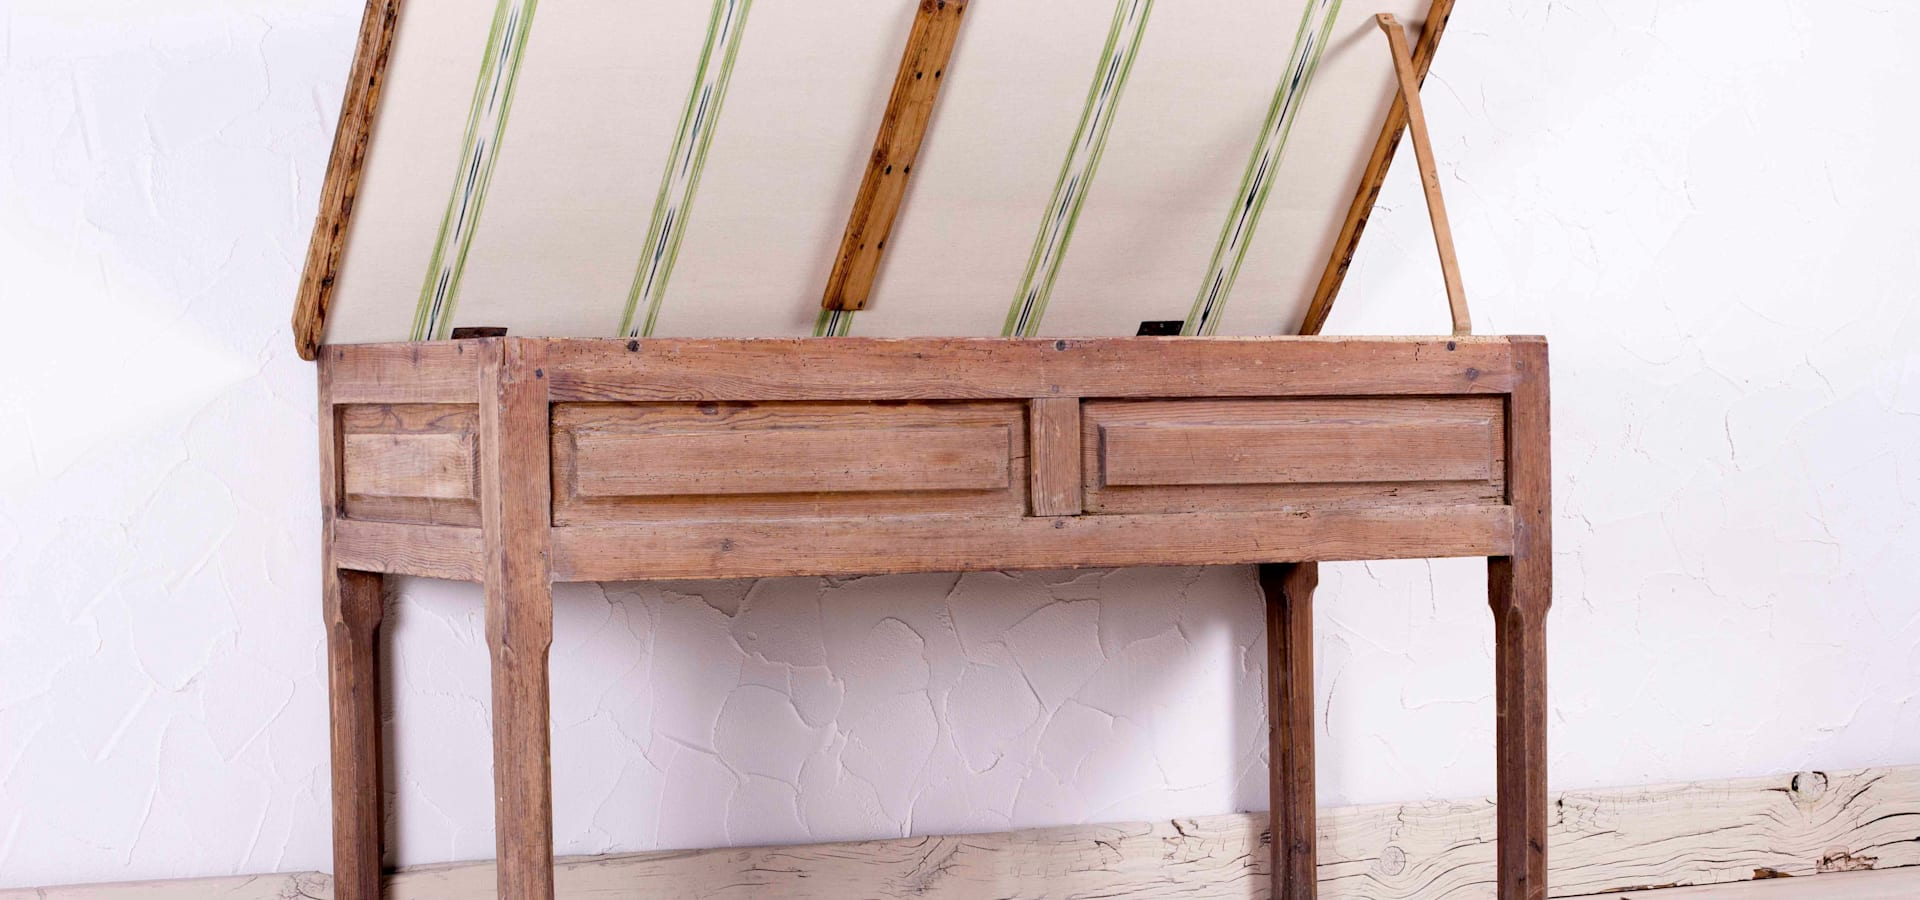 Muebles Restaurados De Renacex Homify # Muebles Restaurados